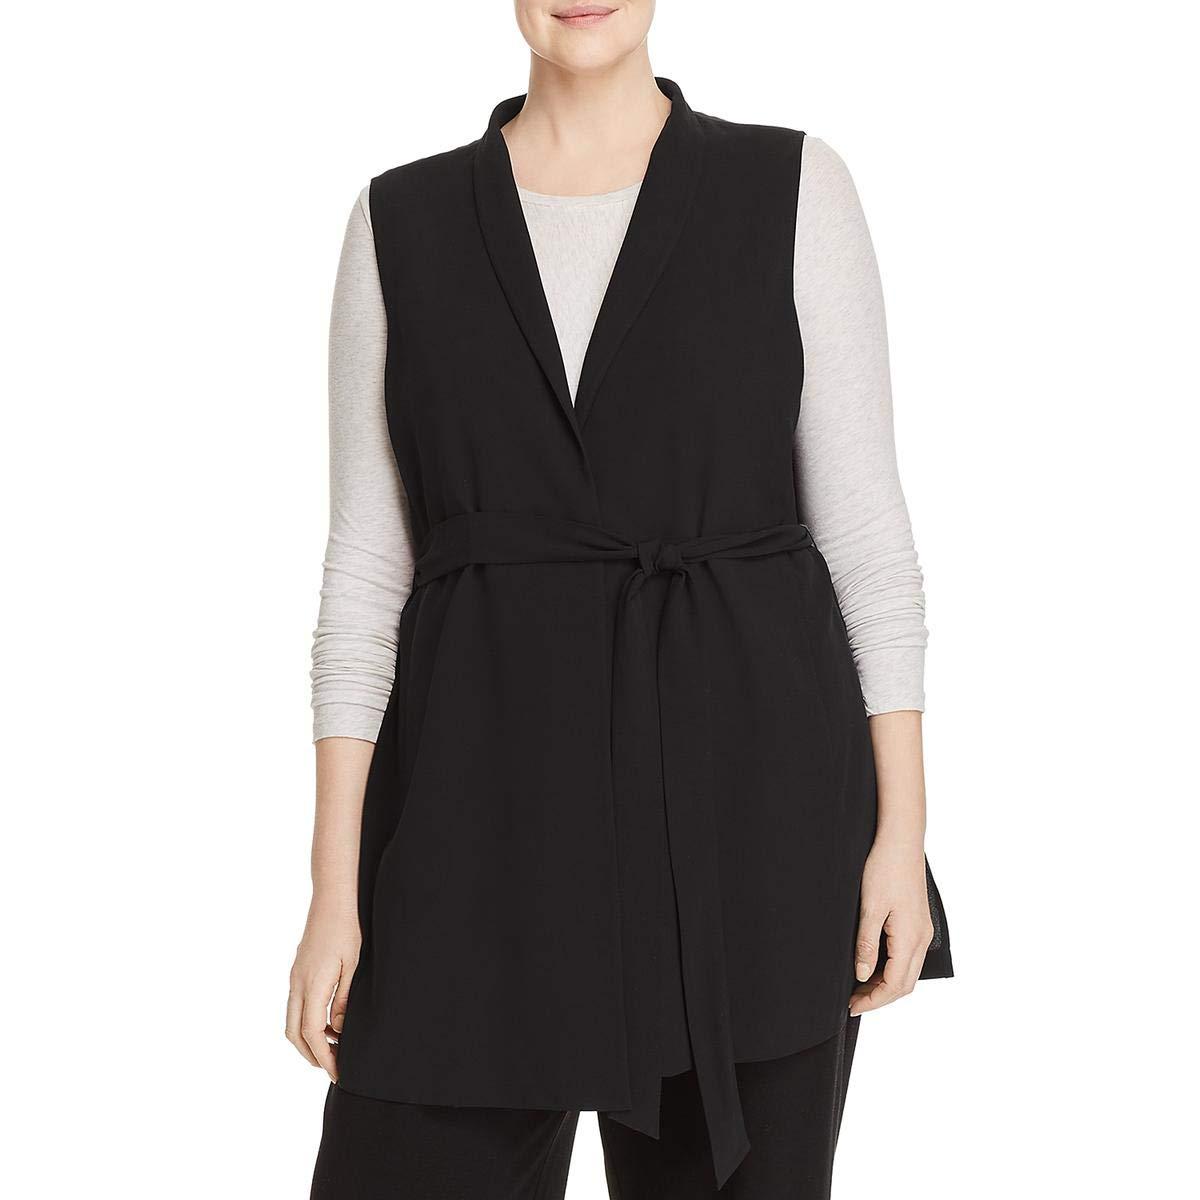 Black EileenFisher Womens Plus Silk Drapey Vest